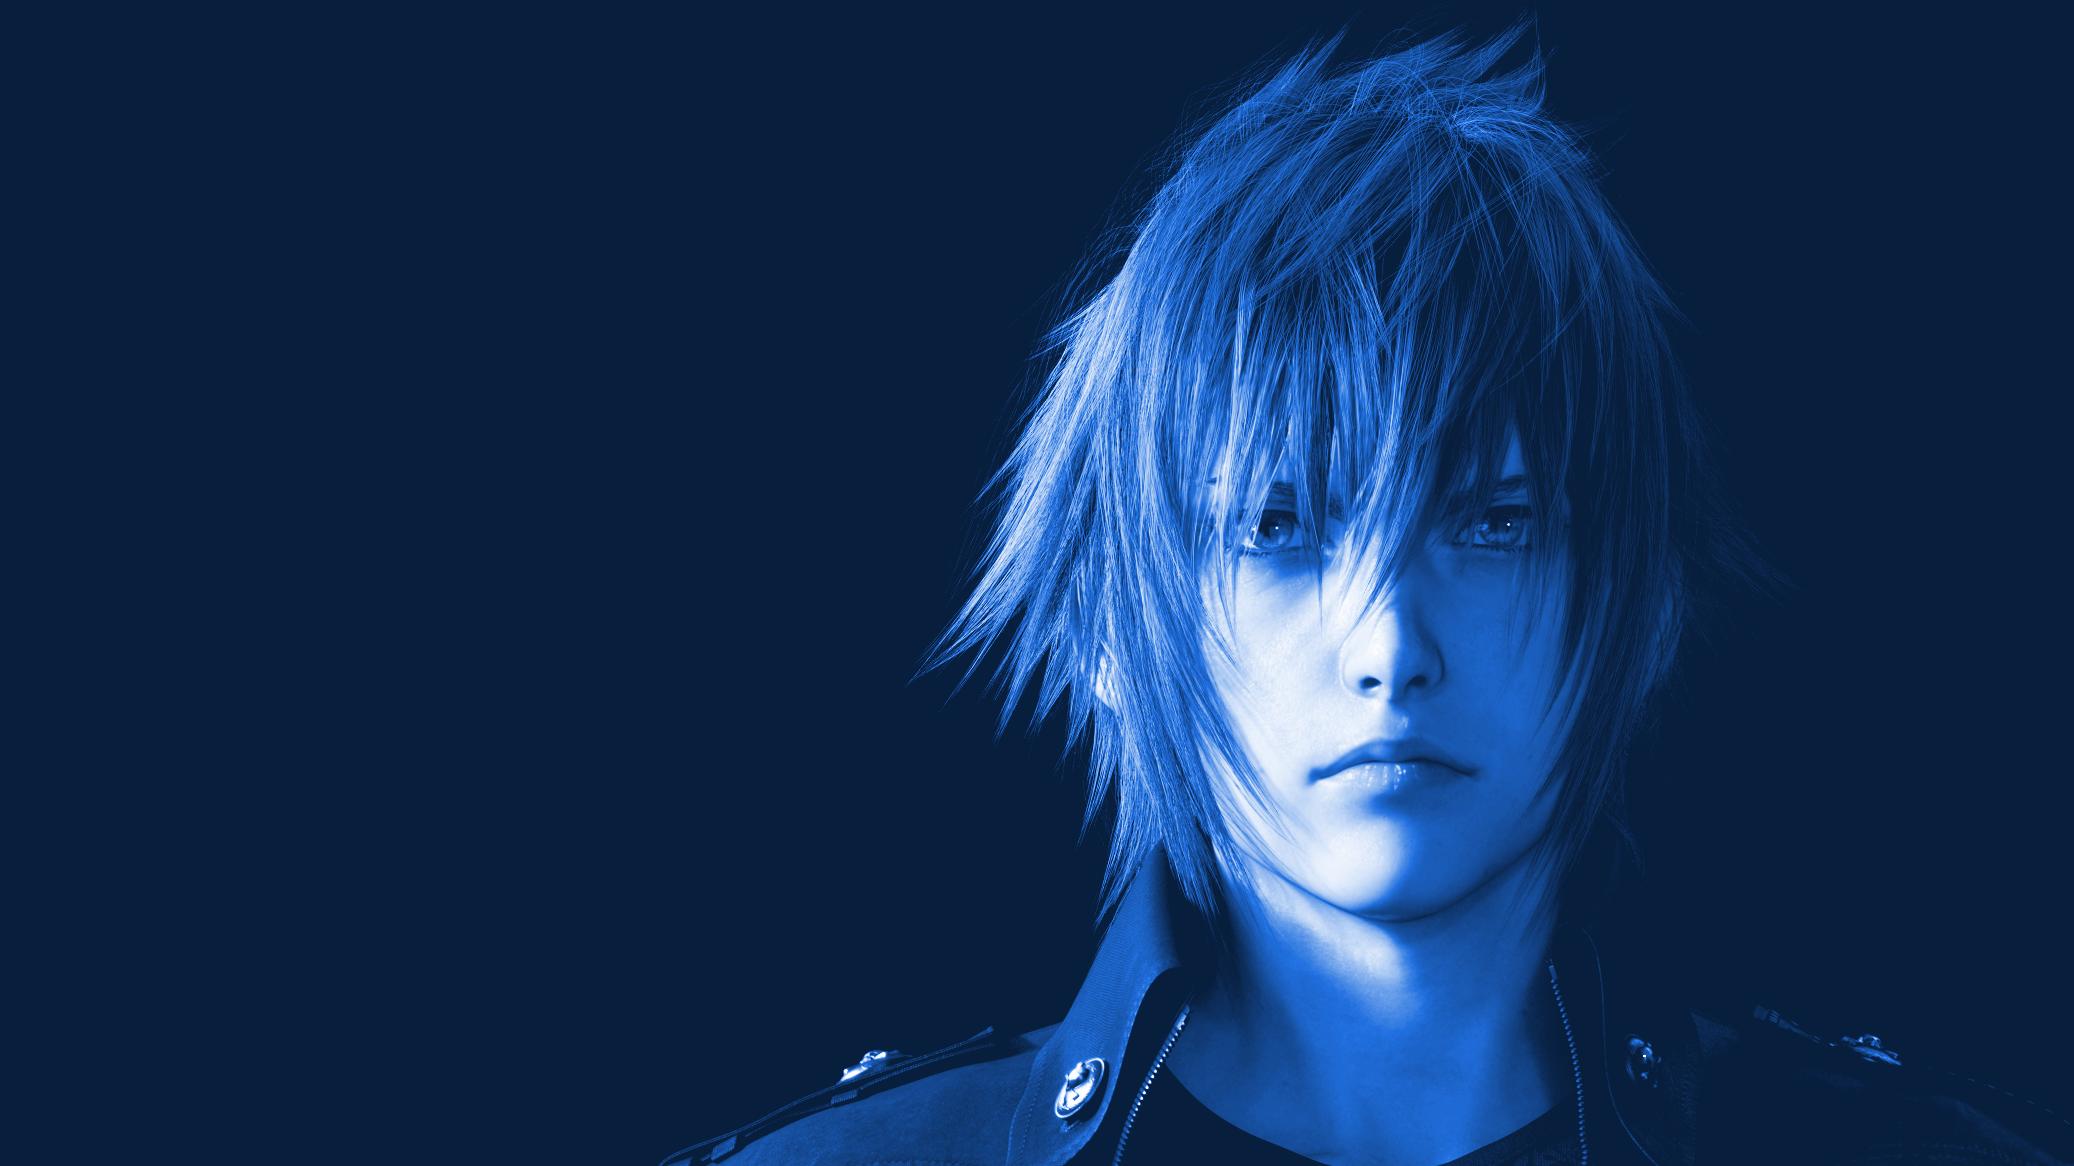 Noctis Wallpaper 2 Final Fantasy XV 37726119 2074x1166